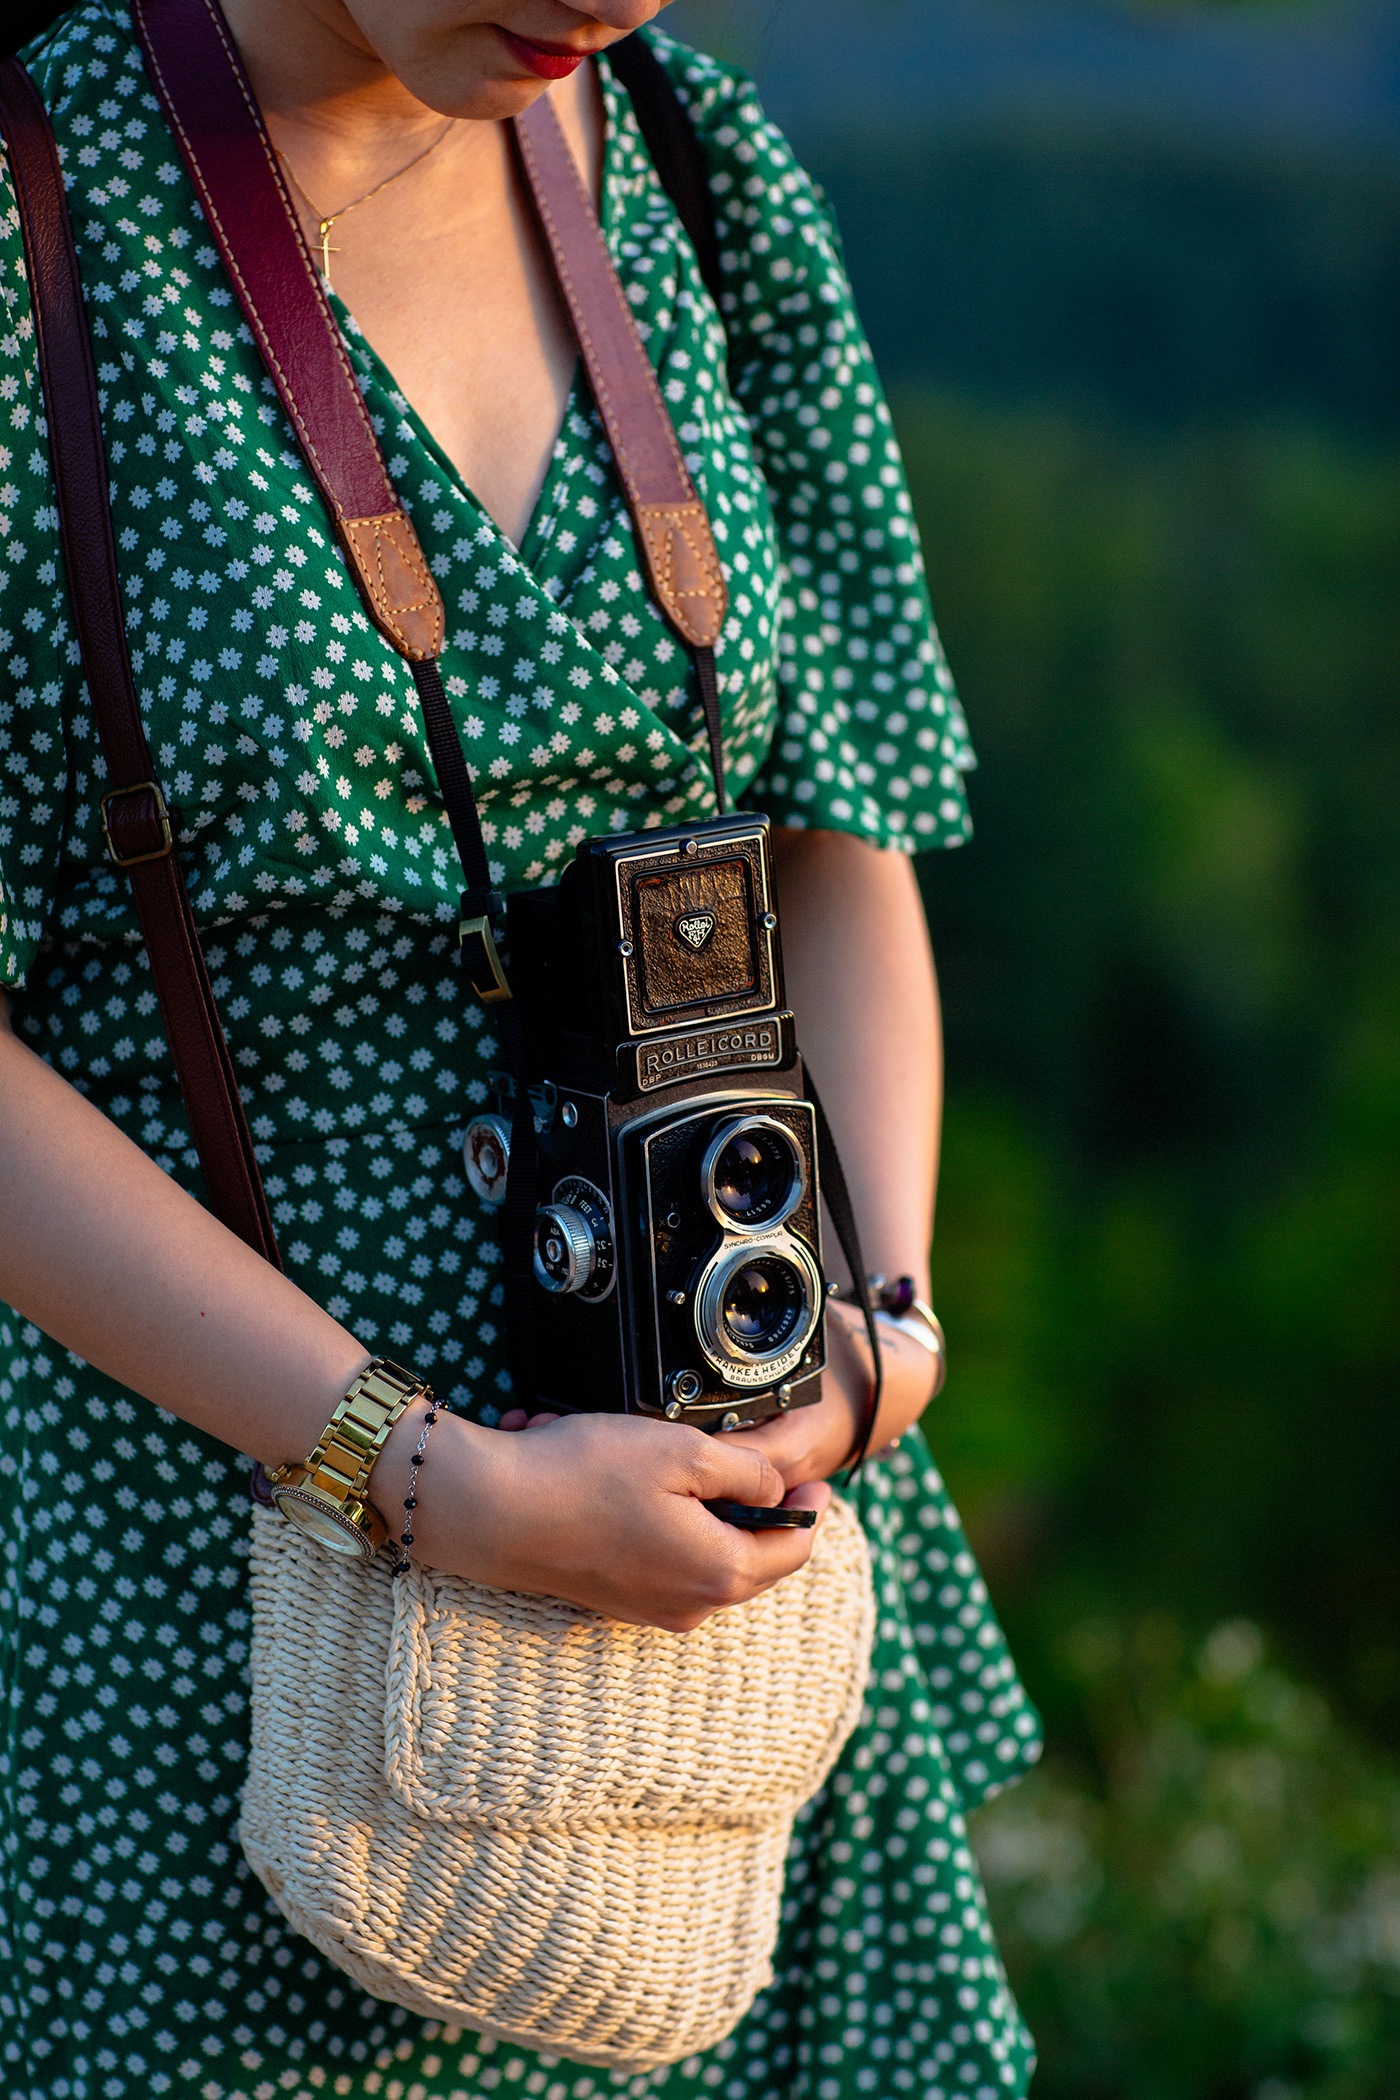 digital photography  Fine art Portrait Photography  portrait portrait photography